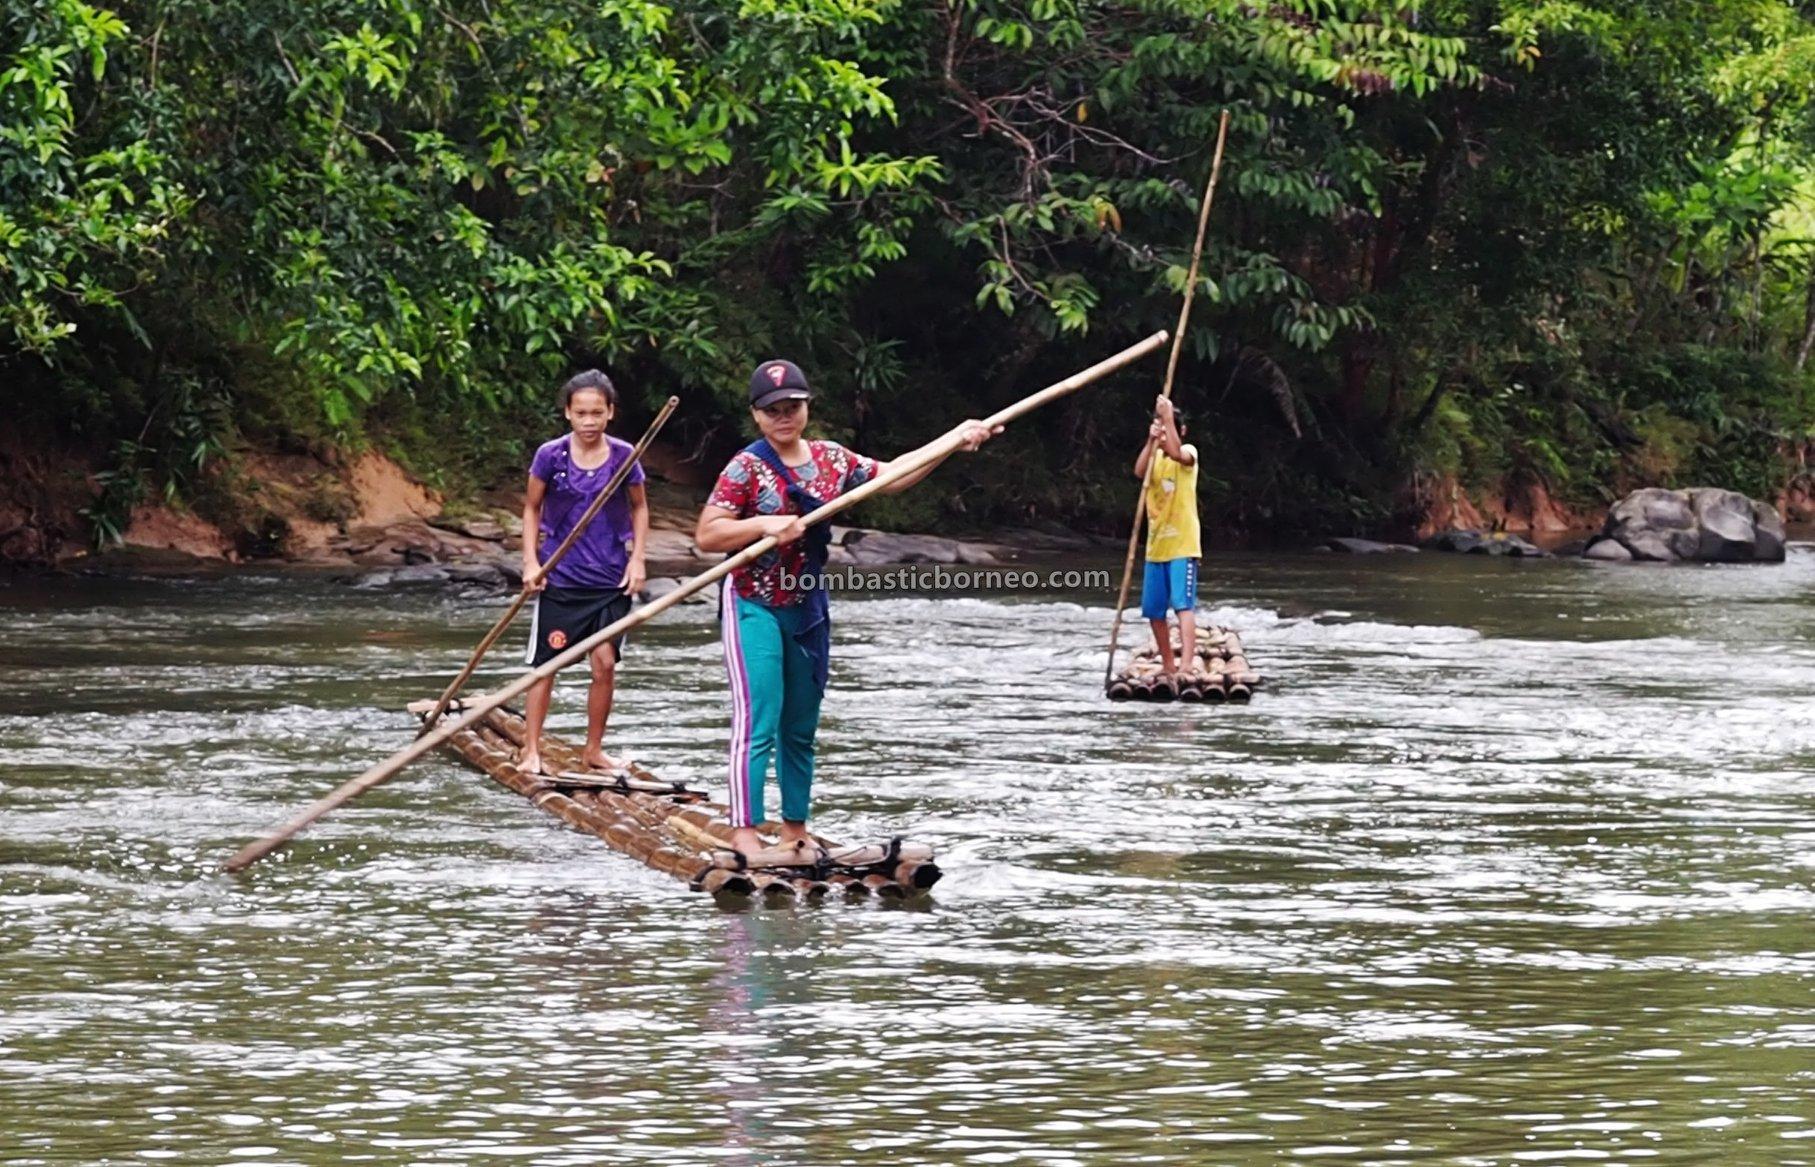 Air Terjun, Riam Kodu, Dusun Simpang Empat, nature, Indonesia, Kalimantan Barat, Bengkayang, Desa Bengkawan, Seluas, Tourism, travel guide, native, village, Trans Borneo, bamboo rafting